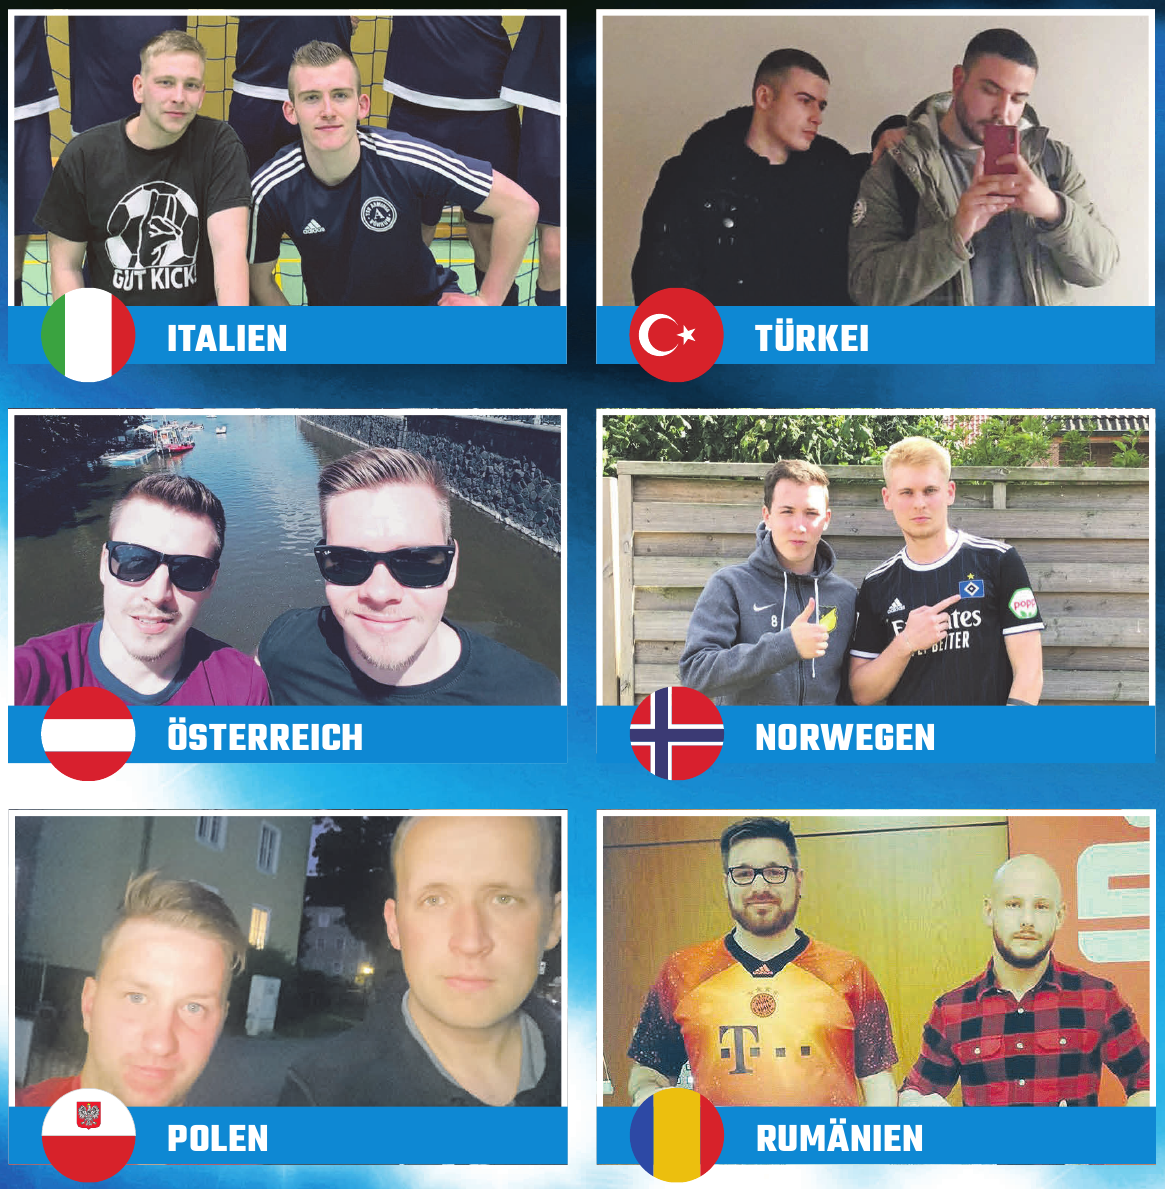 Anpfiff für den E-Soccer-Cup Image 2